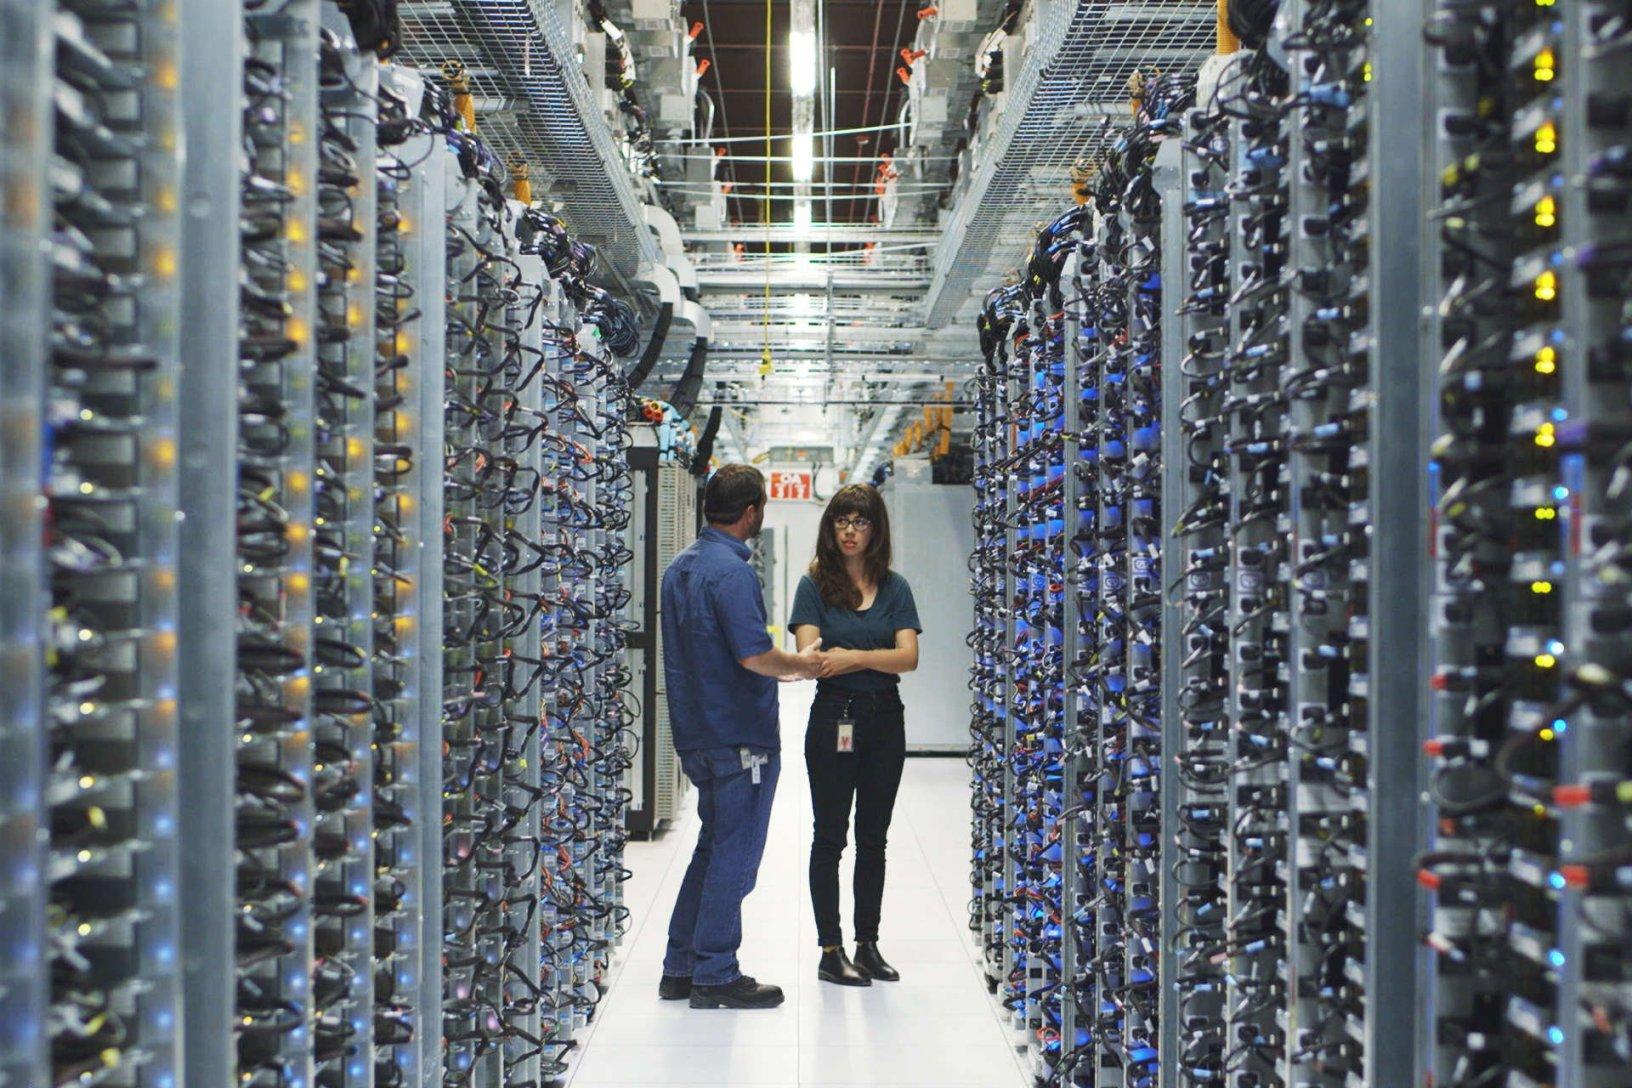 DNS хостинг, DNS сервер, DNS, облачный хостинг, виртуальный сервер, VPS, SSL сертификат, хостинг, облачный провайдер, Беларусь, Serverspace.by